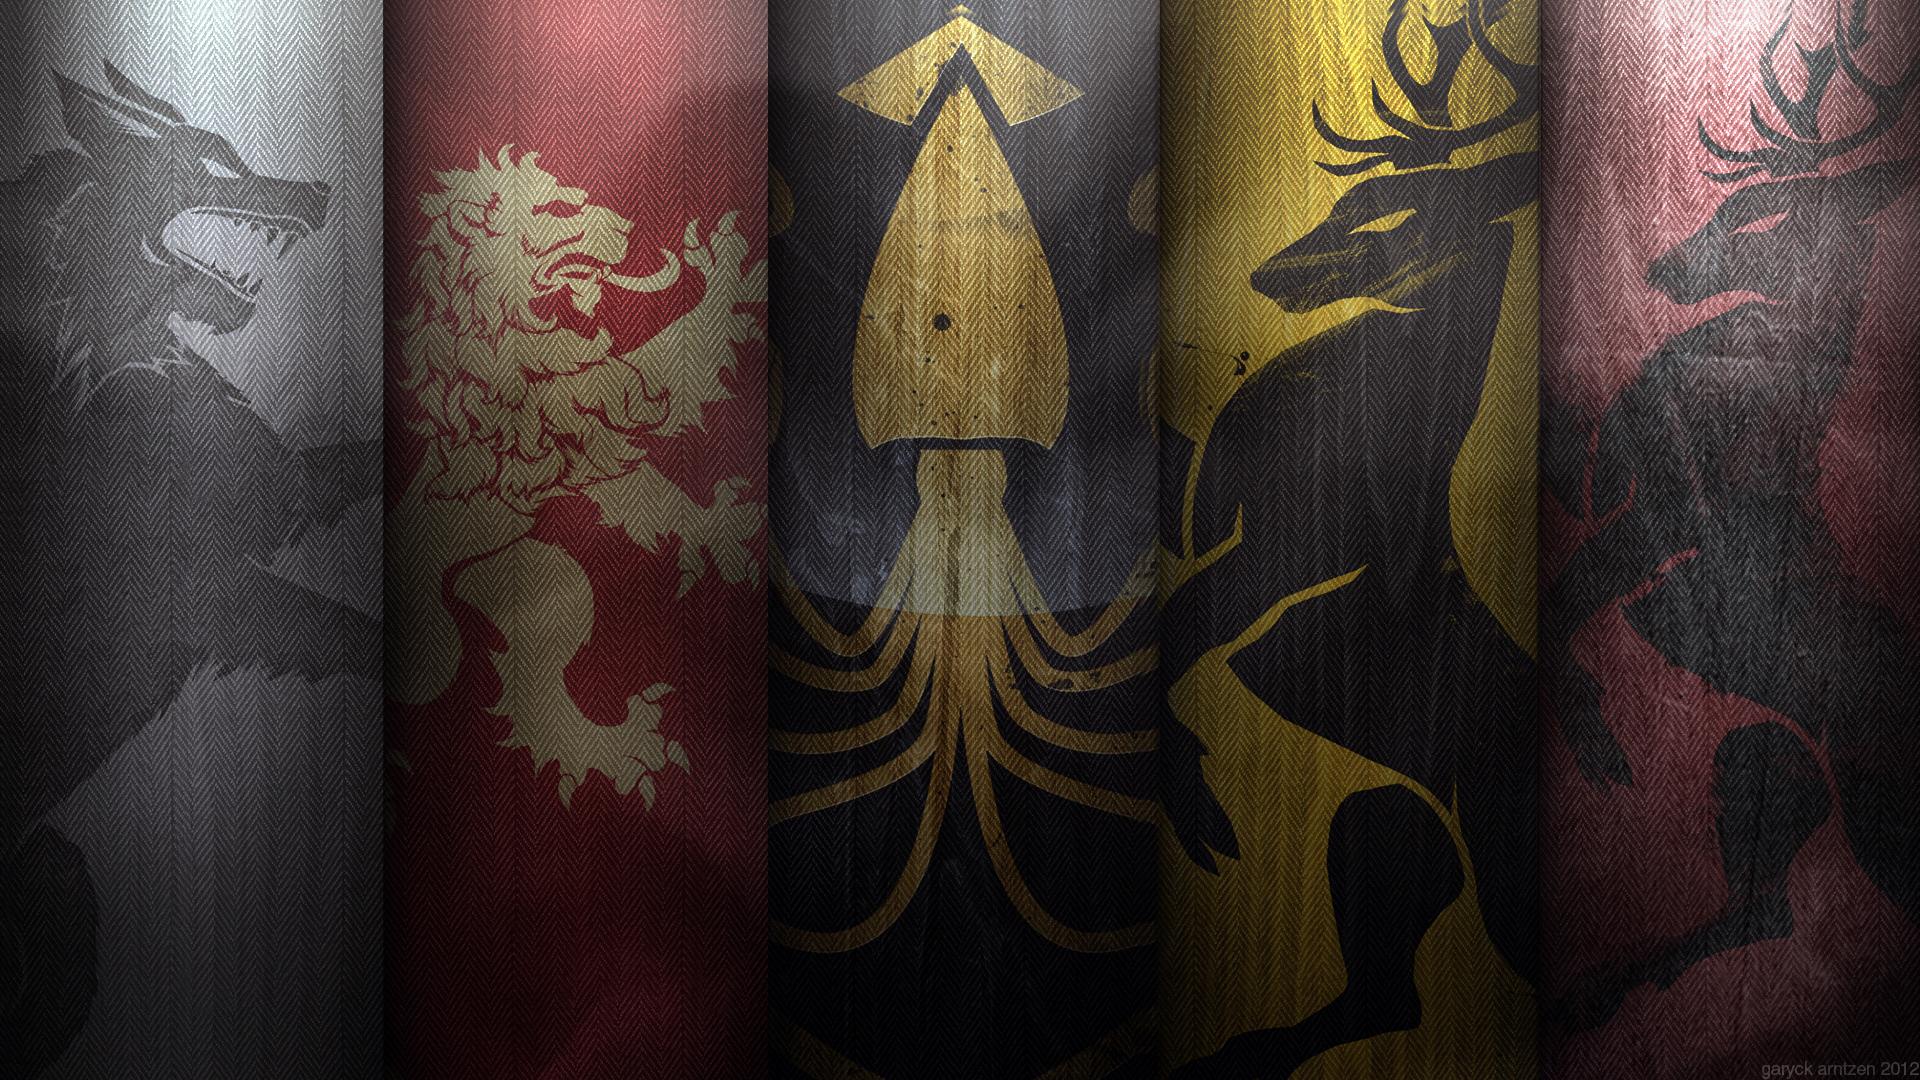 Game of Thrones Season 4 Wallpapers for iPad iPad Mini Tricks 1920x1080